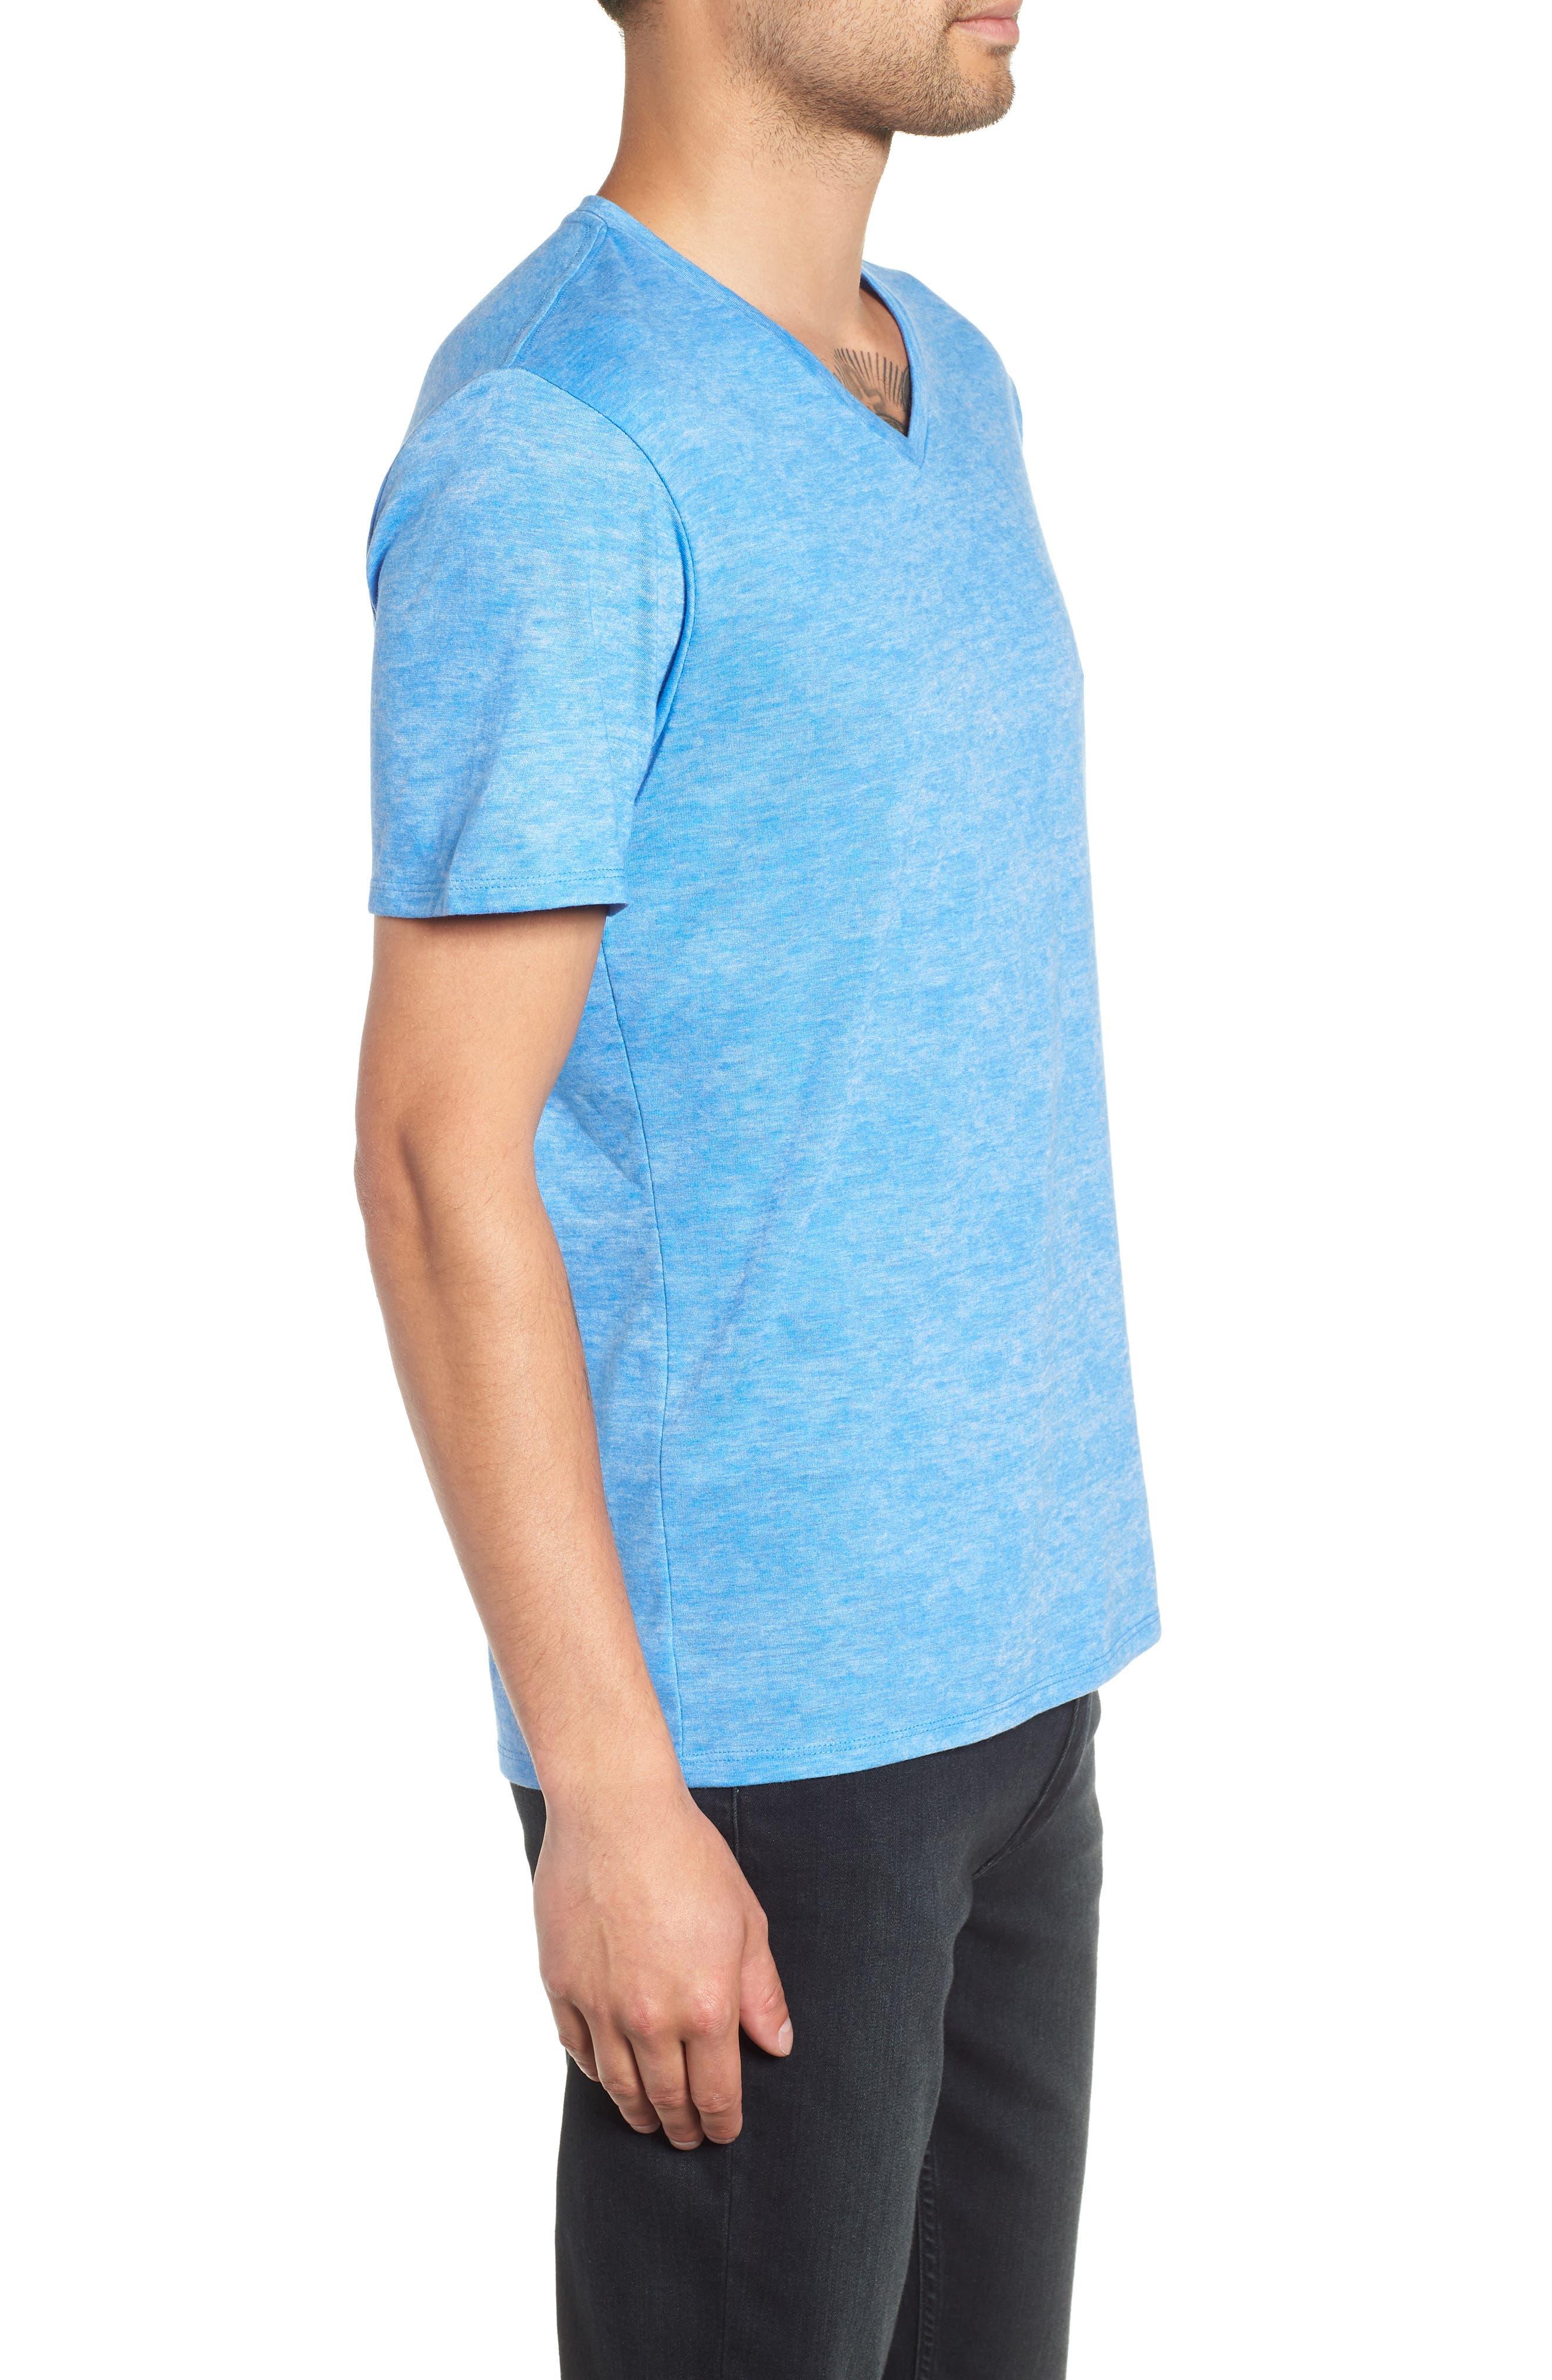 Burnout V-Neck T-Shirt,                             Alternate thumbnail 3, color,                             BLUE BLISS- WHITE BURNOUT